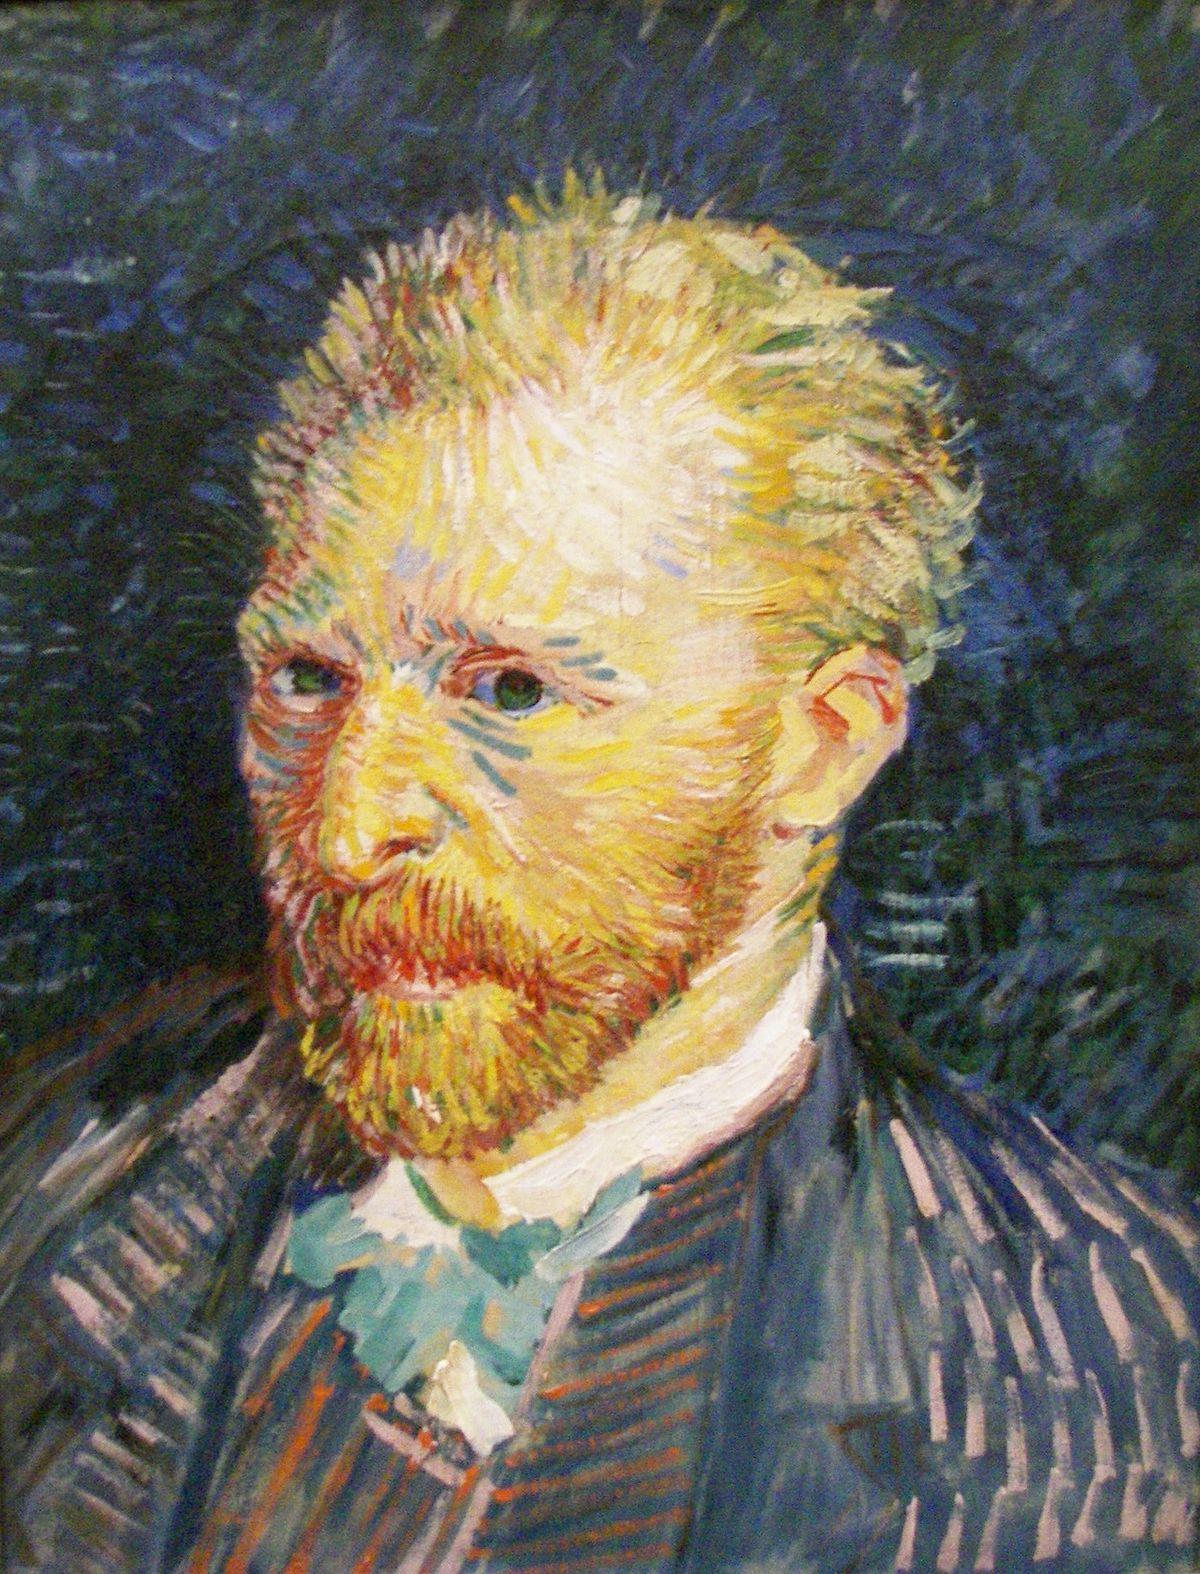 File:Van Gogh Self-Portrait Autumn 1887.jpg - Wikimedia Commons